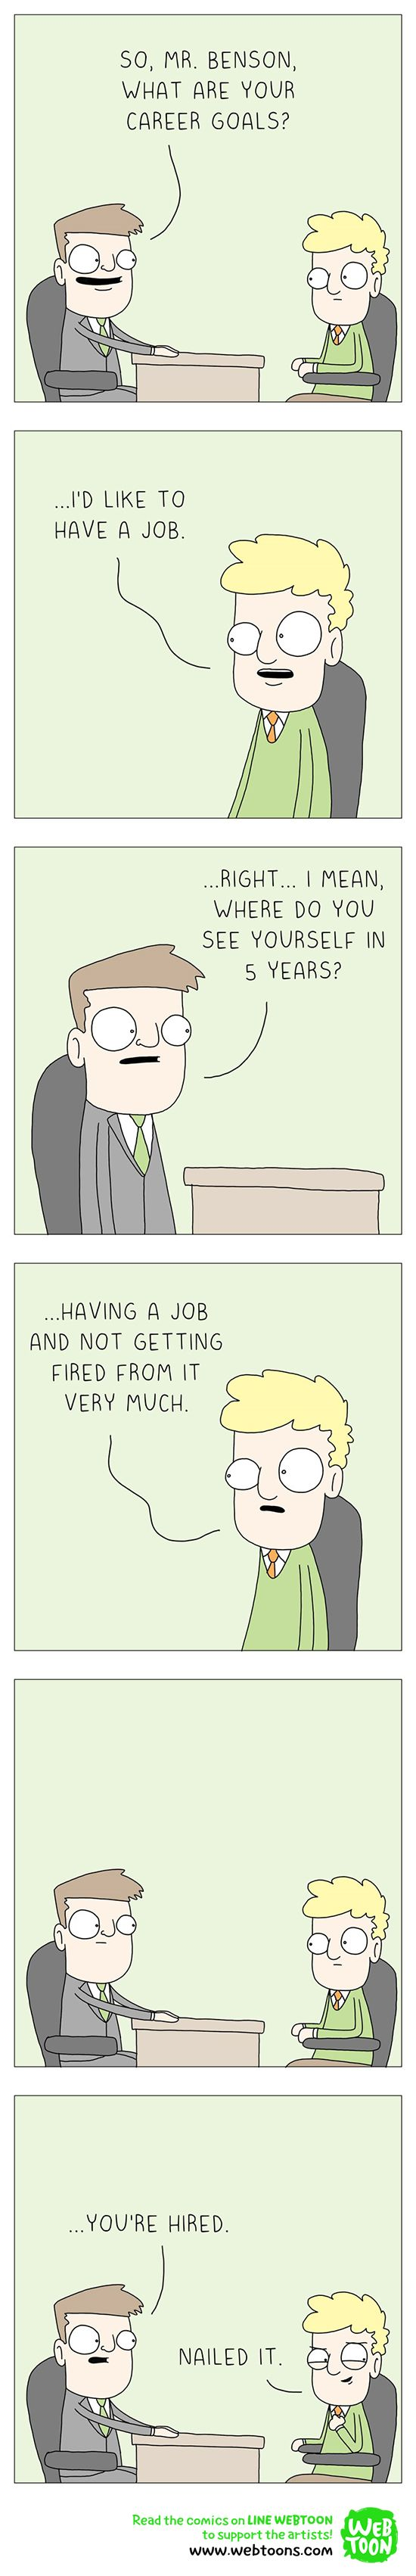 best ideas about solliciteren interview career goals ur